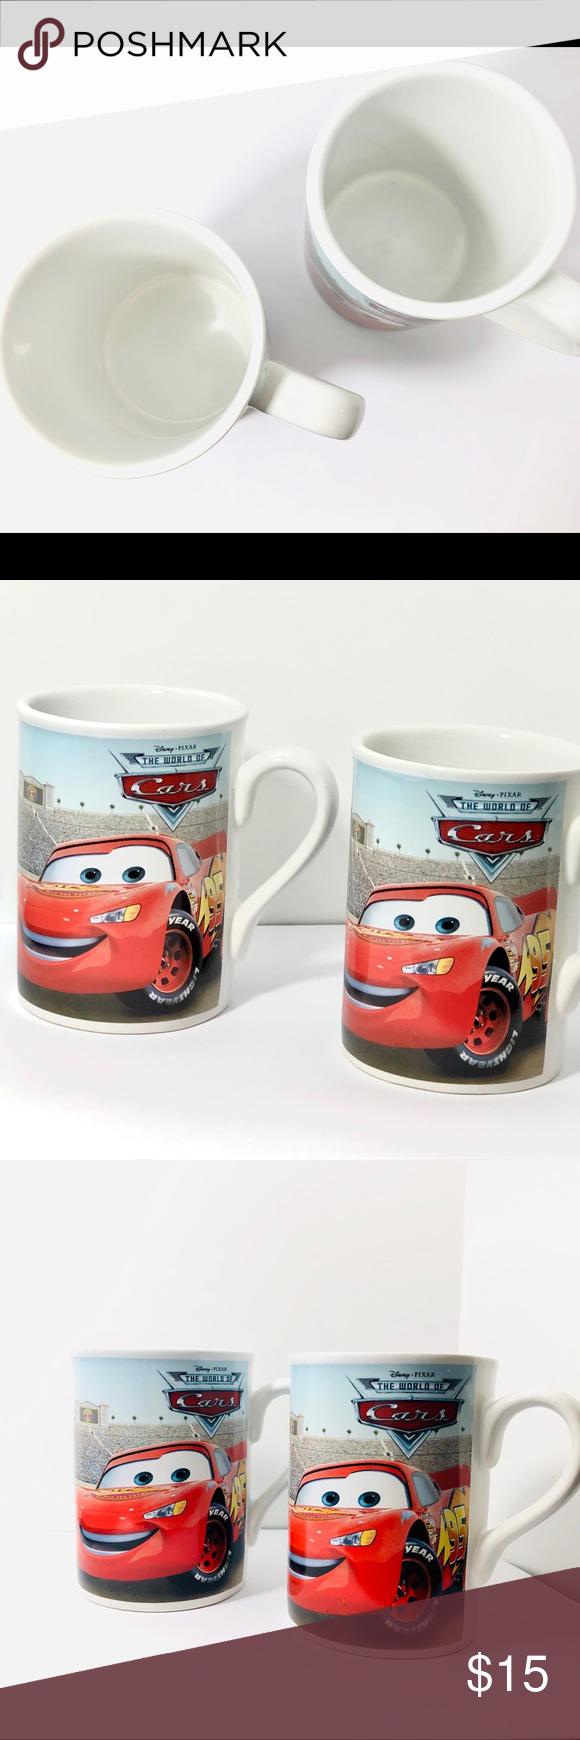 2008 Disney Pixar The World of Cars Coffee Mugs 2008 Disney Pixar The World of Cars Coffee Mug Set Disney Kitchen Coffee & Tea Accessories #disneycoffeemugs